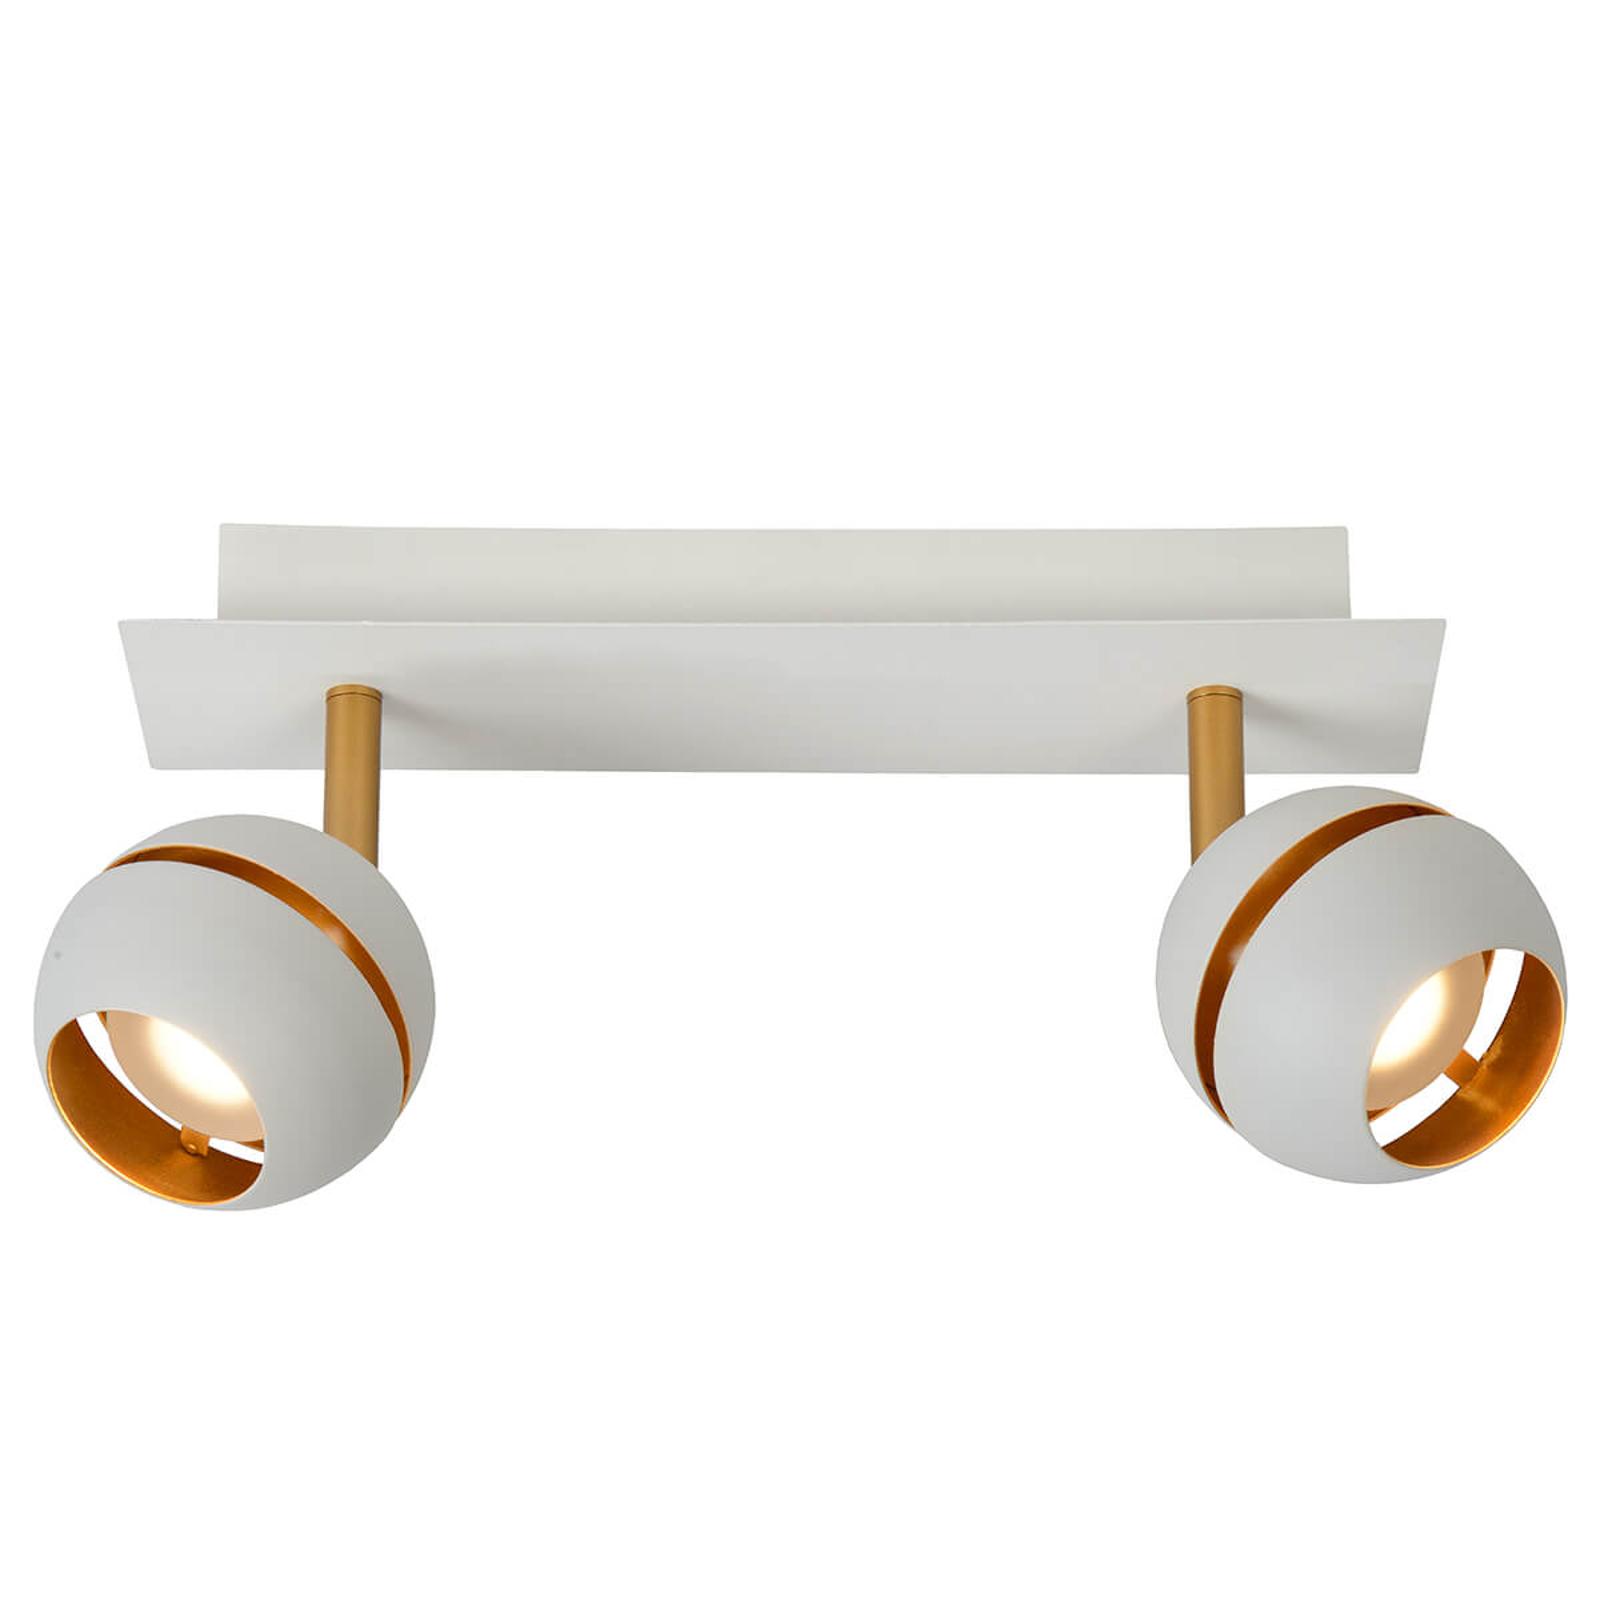 Regulowana lampa sufitowa LED Binari, 2-punktowa